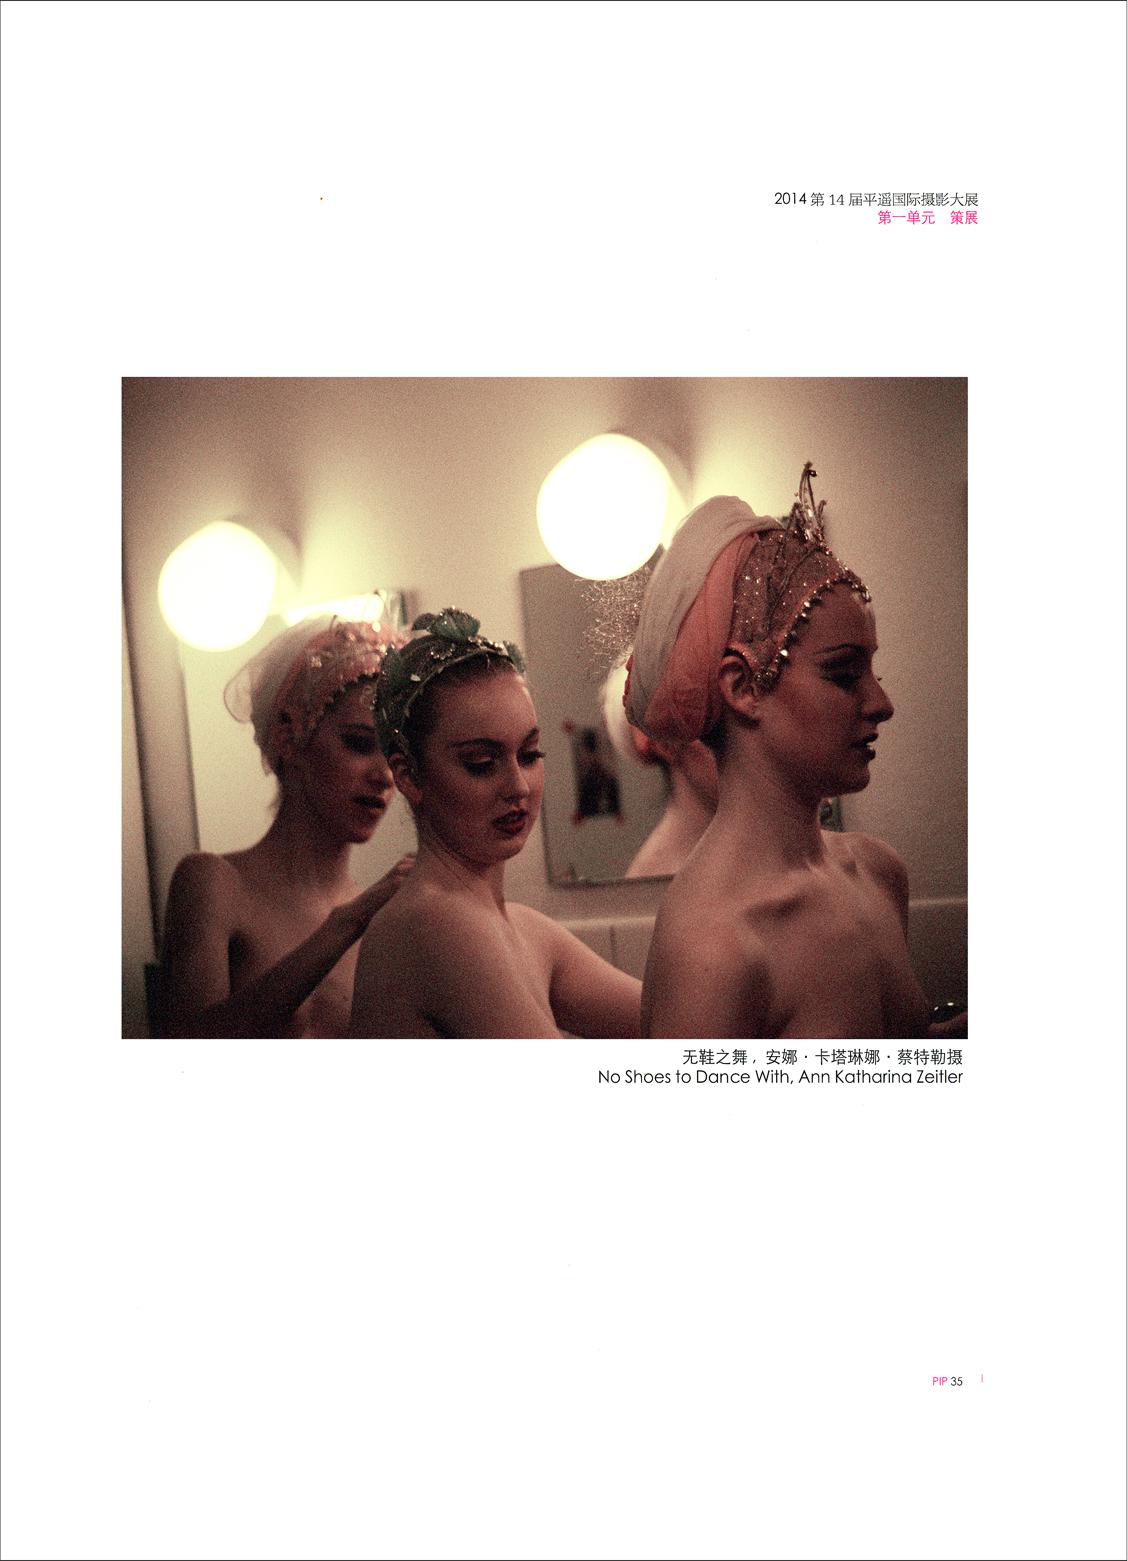 Catalogue 14th Pingyao International Photography Festival Pingyao, China, 2014